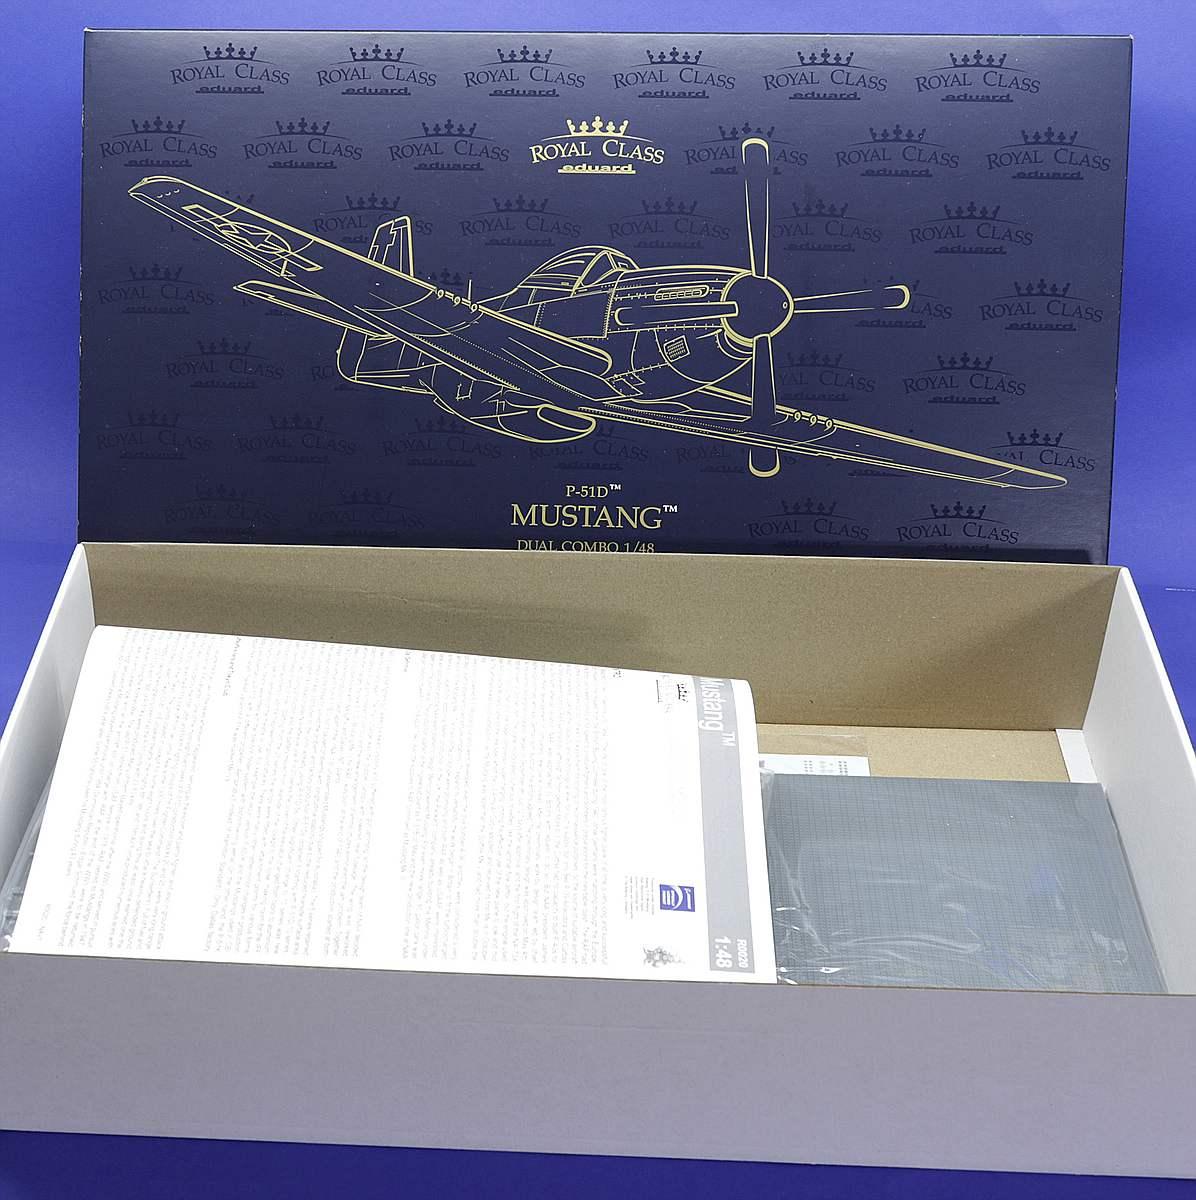 Eduard-R-0020-P-51-Mustang-Royal-Class-Karton-Übersicht Eduards P-51 Mustang in 1:48 als Royal Class Edition # R 0020